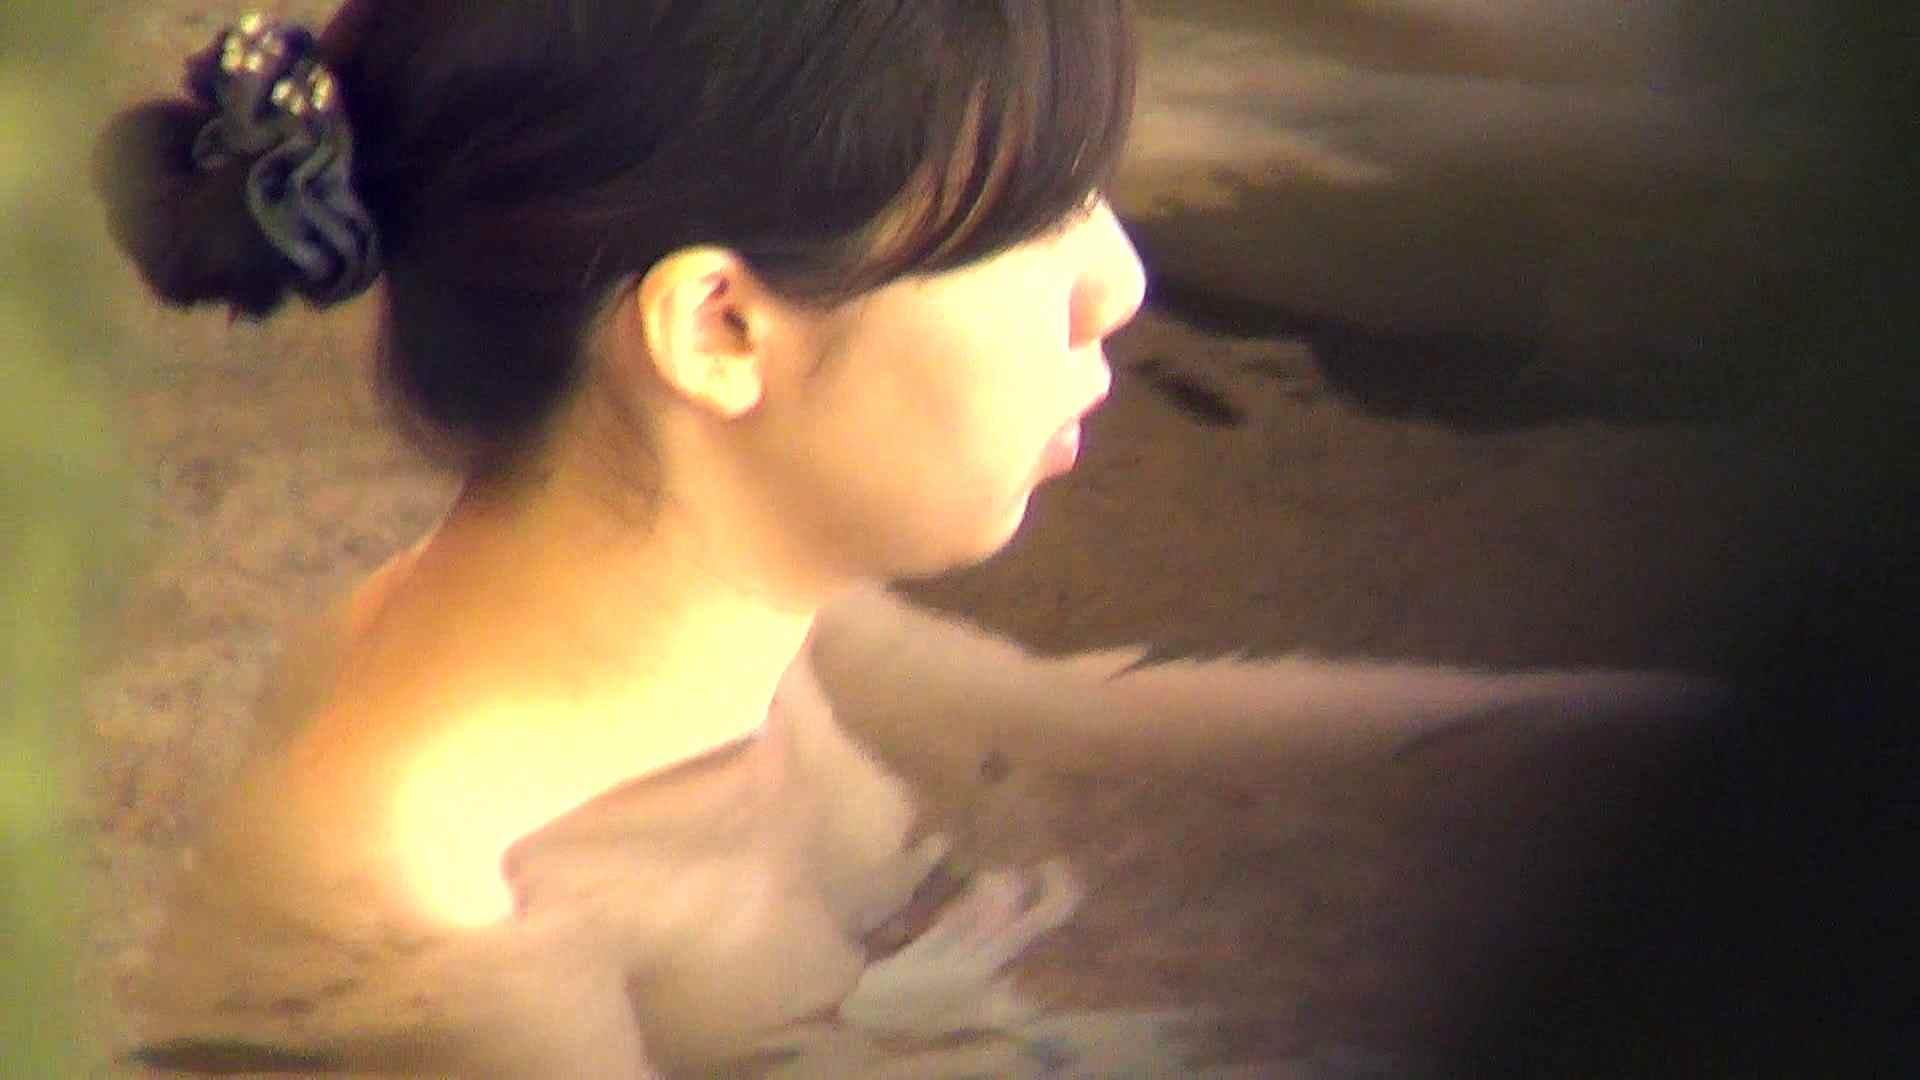 Aquaな露天風呂Vol.285 盗撮  97連発 18